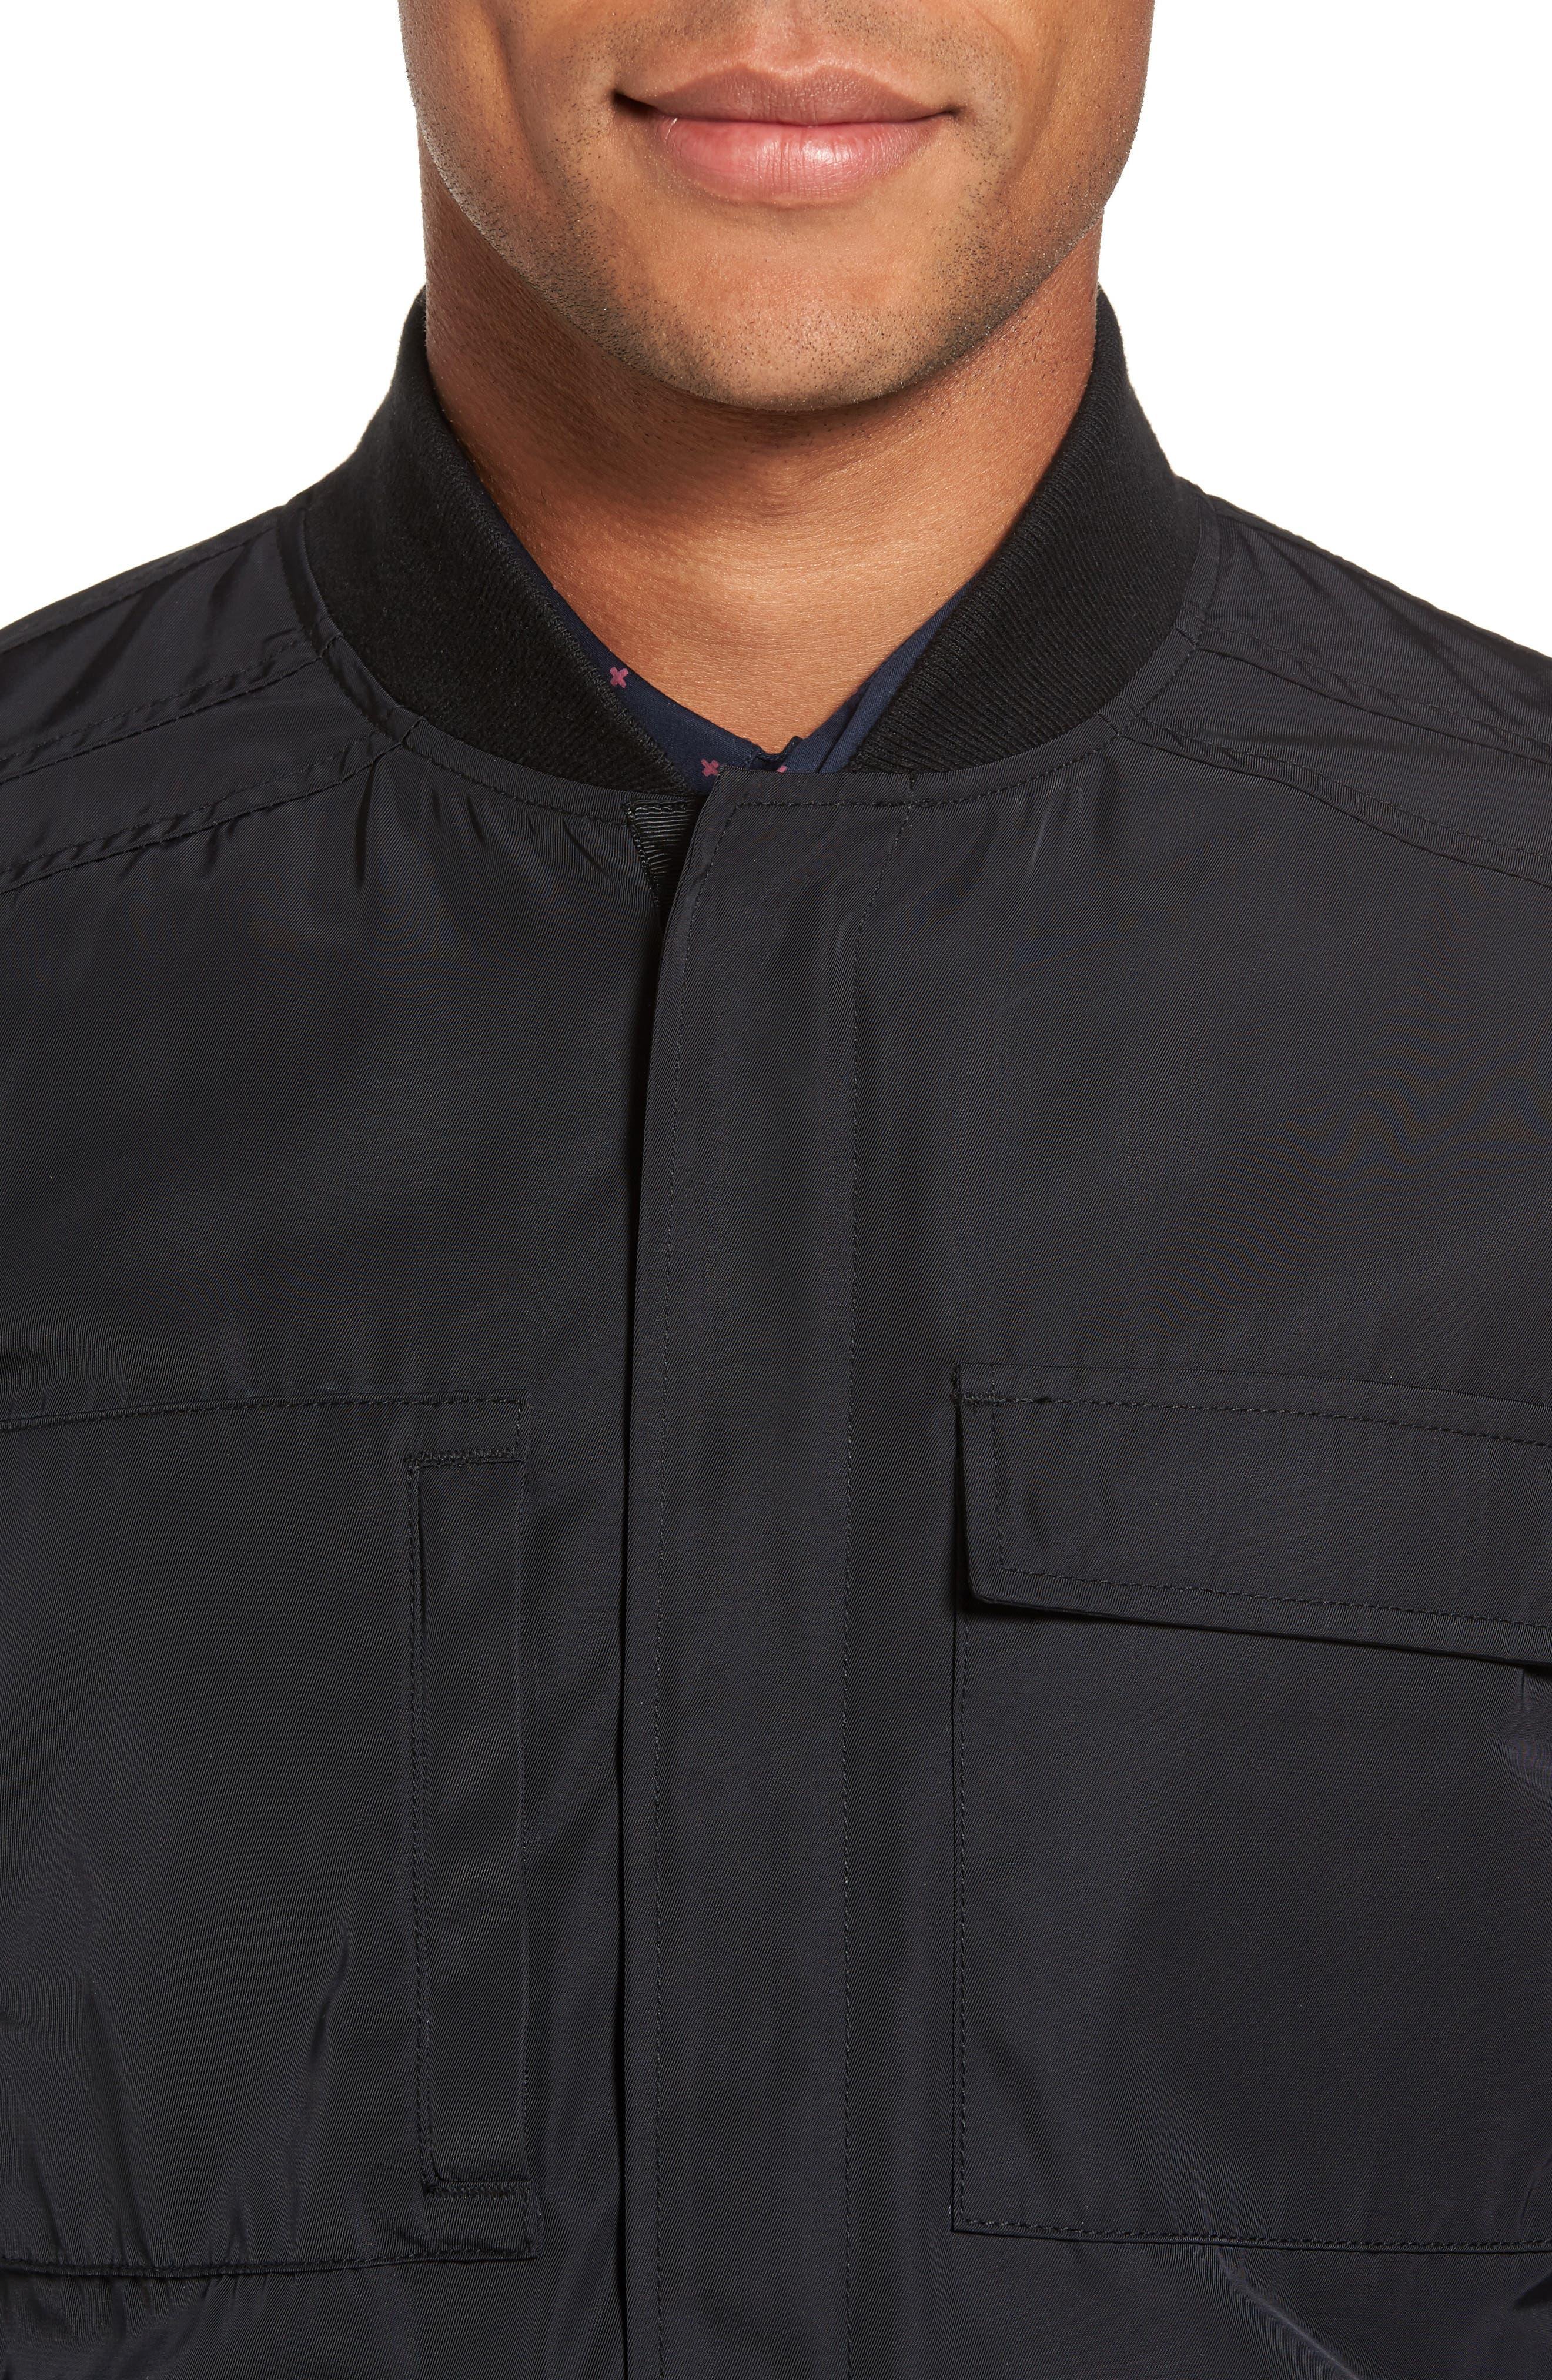 Utility Jacket,                             Alternate thumbnail 4, color,                             001